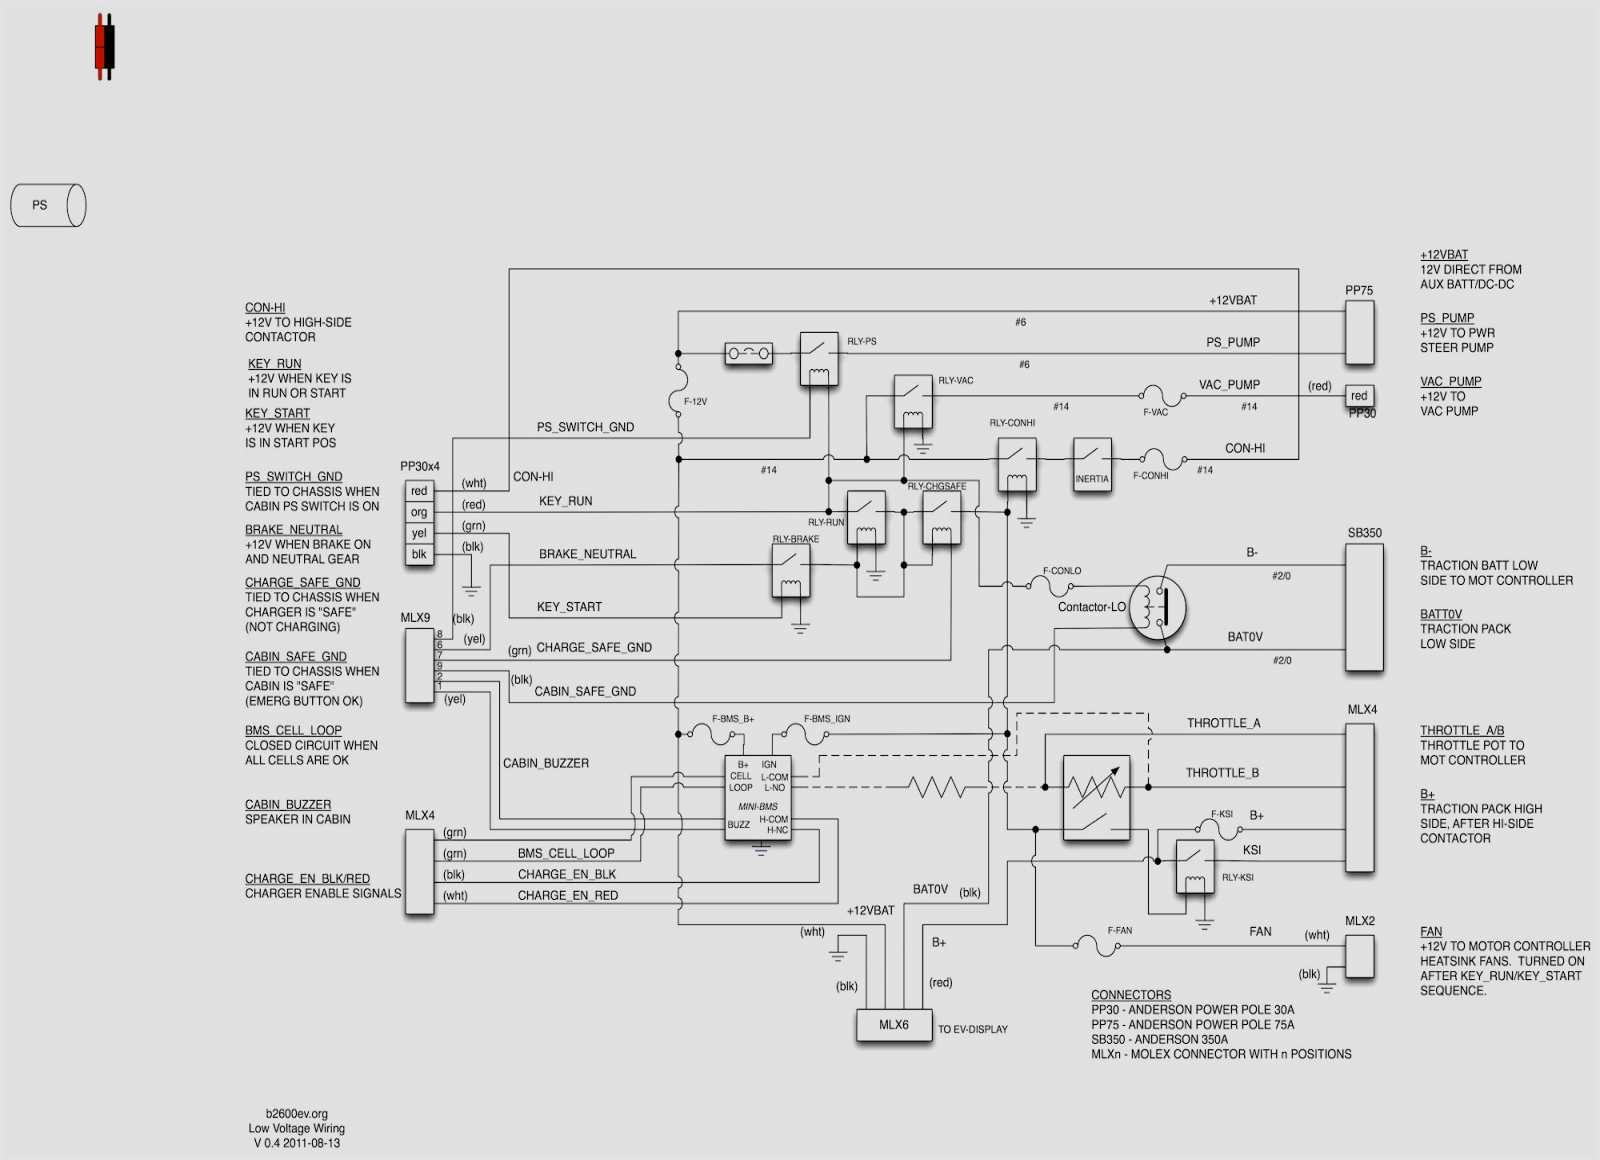 Low Voltage Outdoor Lighting Wiring Diagram | Best Wiring Library - Low Voltage Outdoor Lighting Wiring Diagram